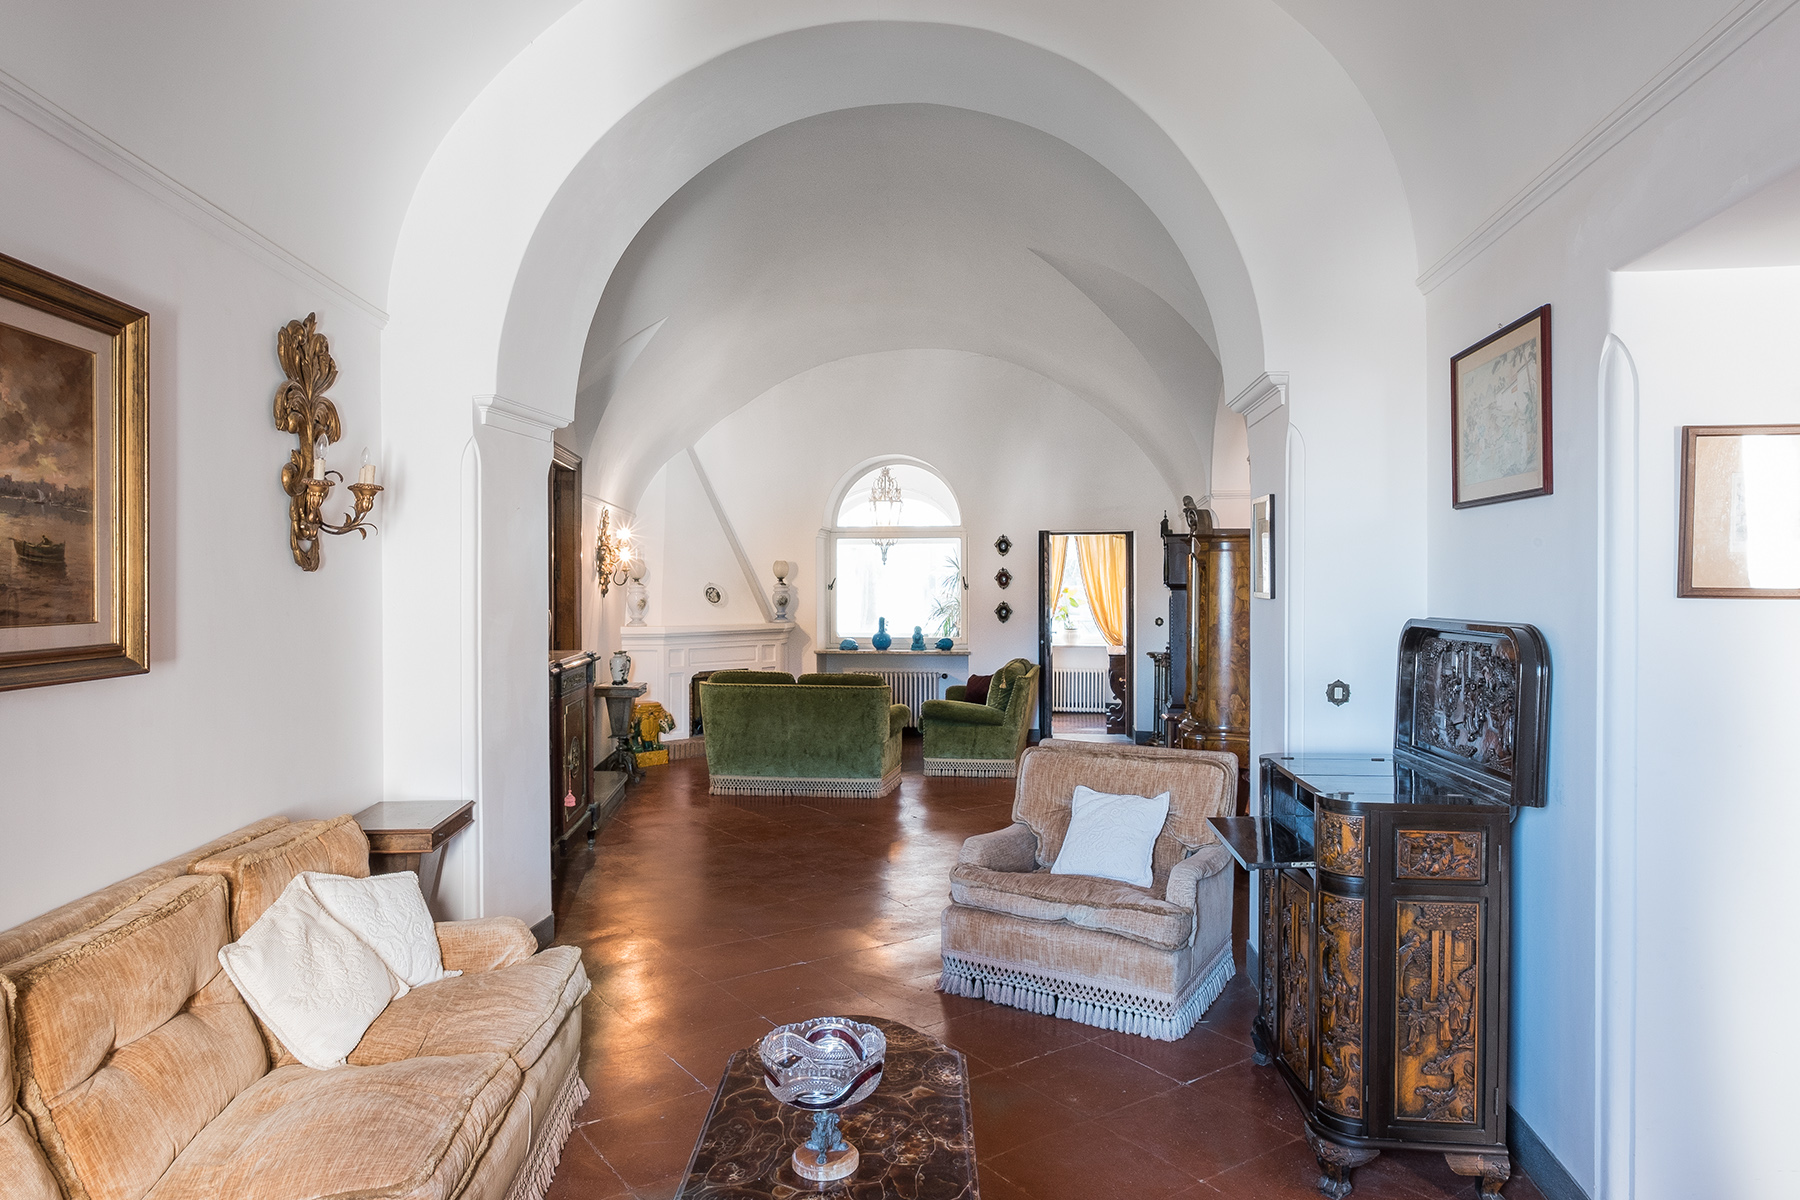 Casa indipendente in Vendita a Capri: 5 locali, 400 mq - Foto 11